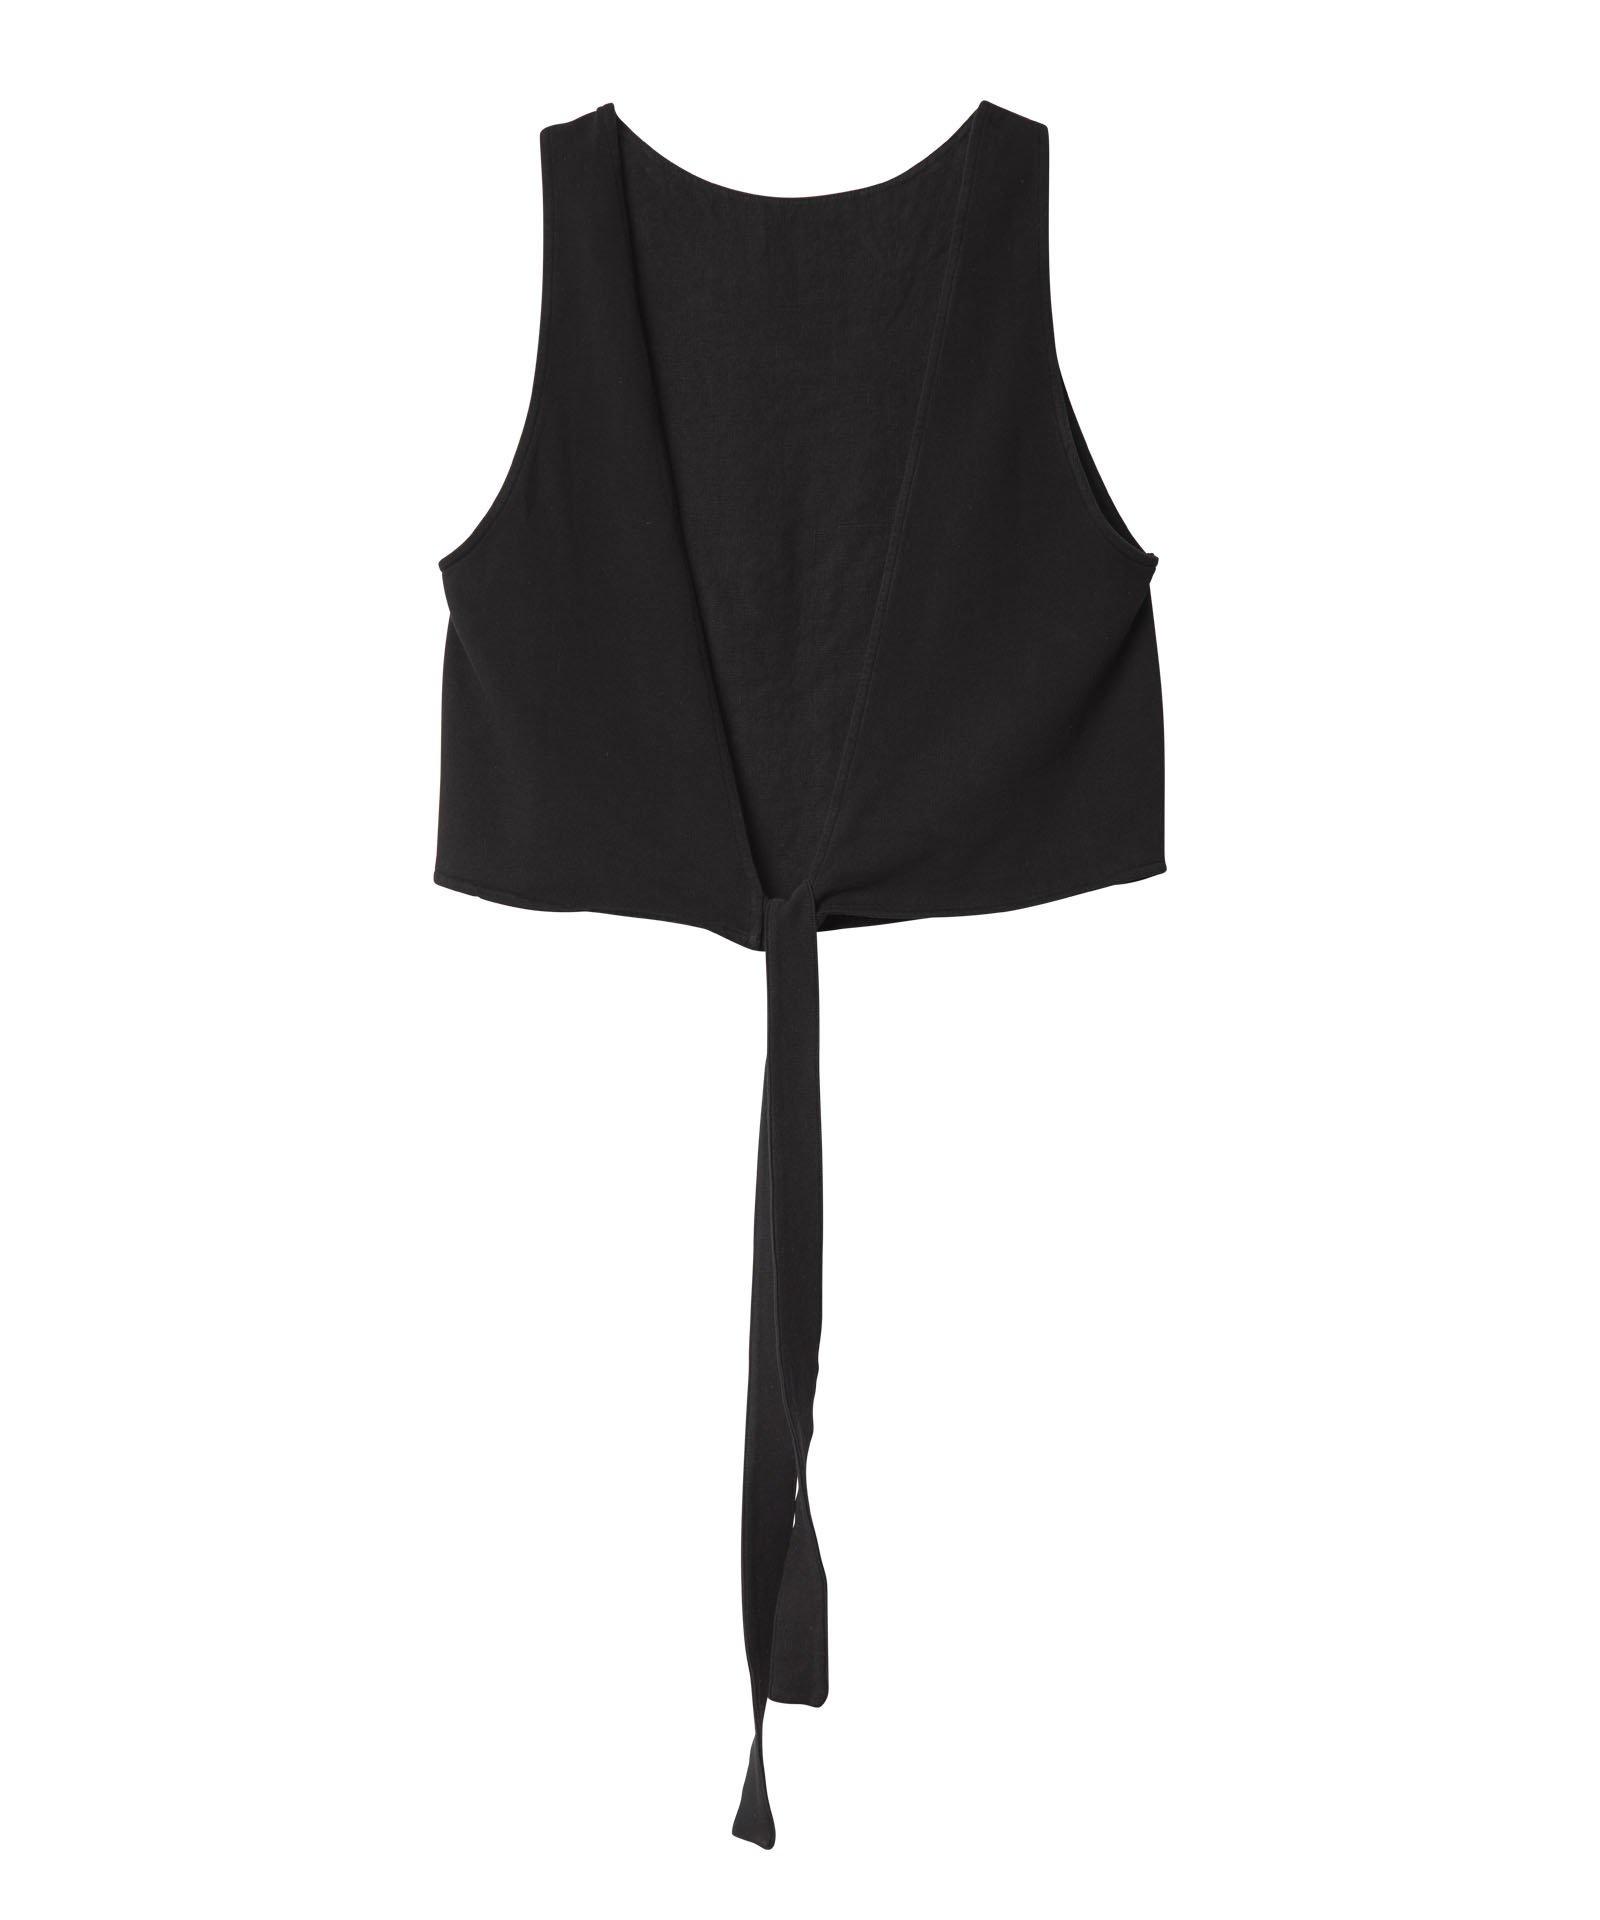 Top knot linen black-3